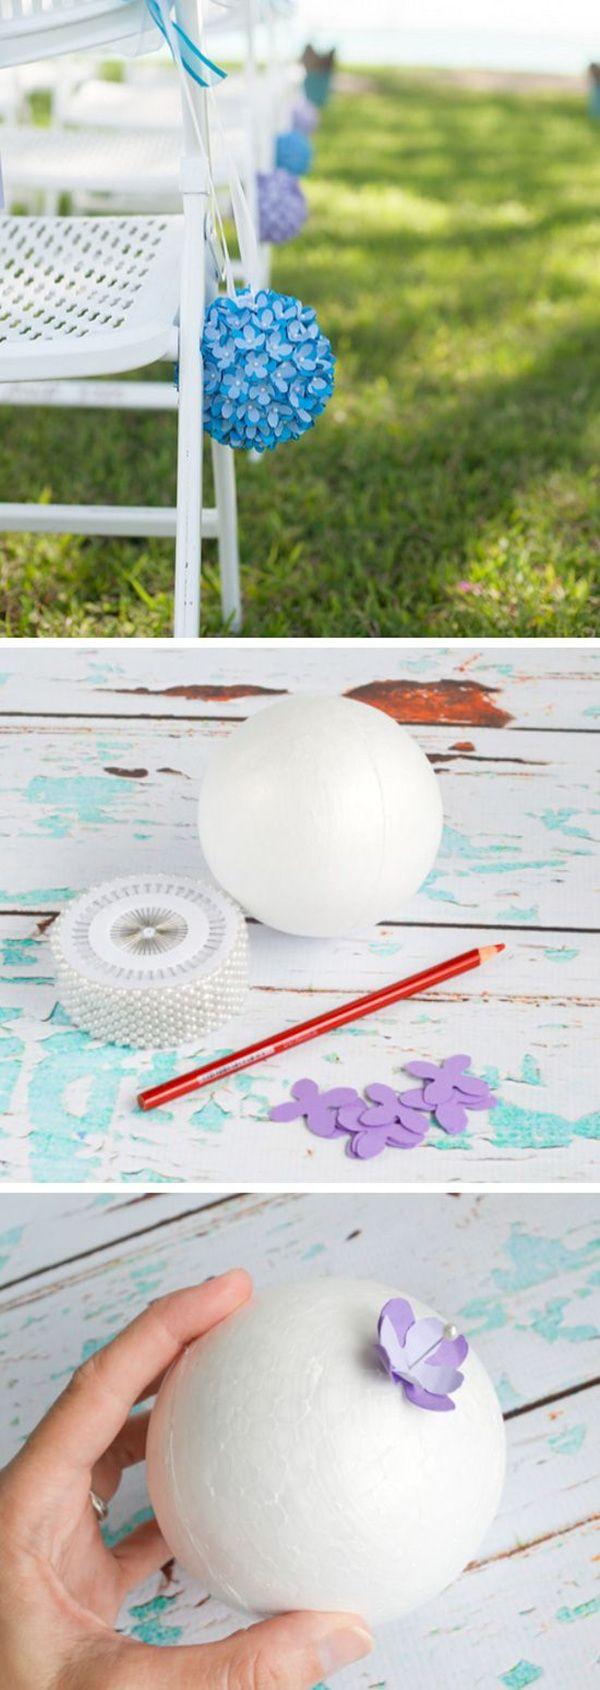 paper flower pomander DIY spring wedding decoration ideas